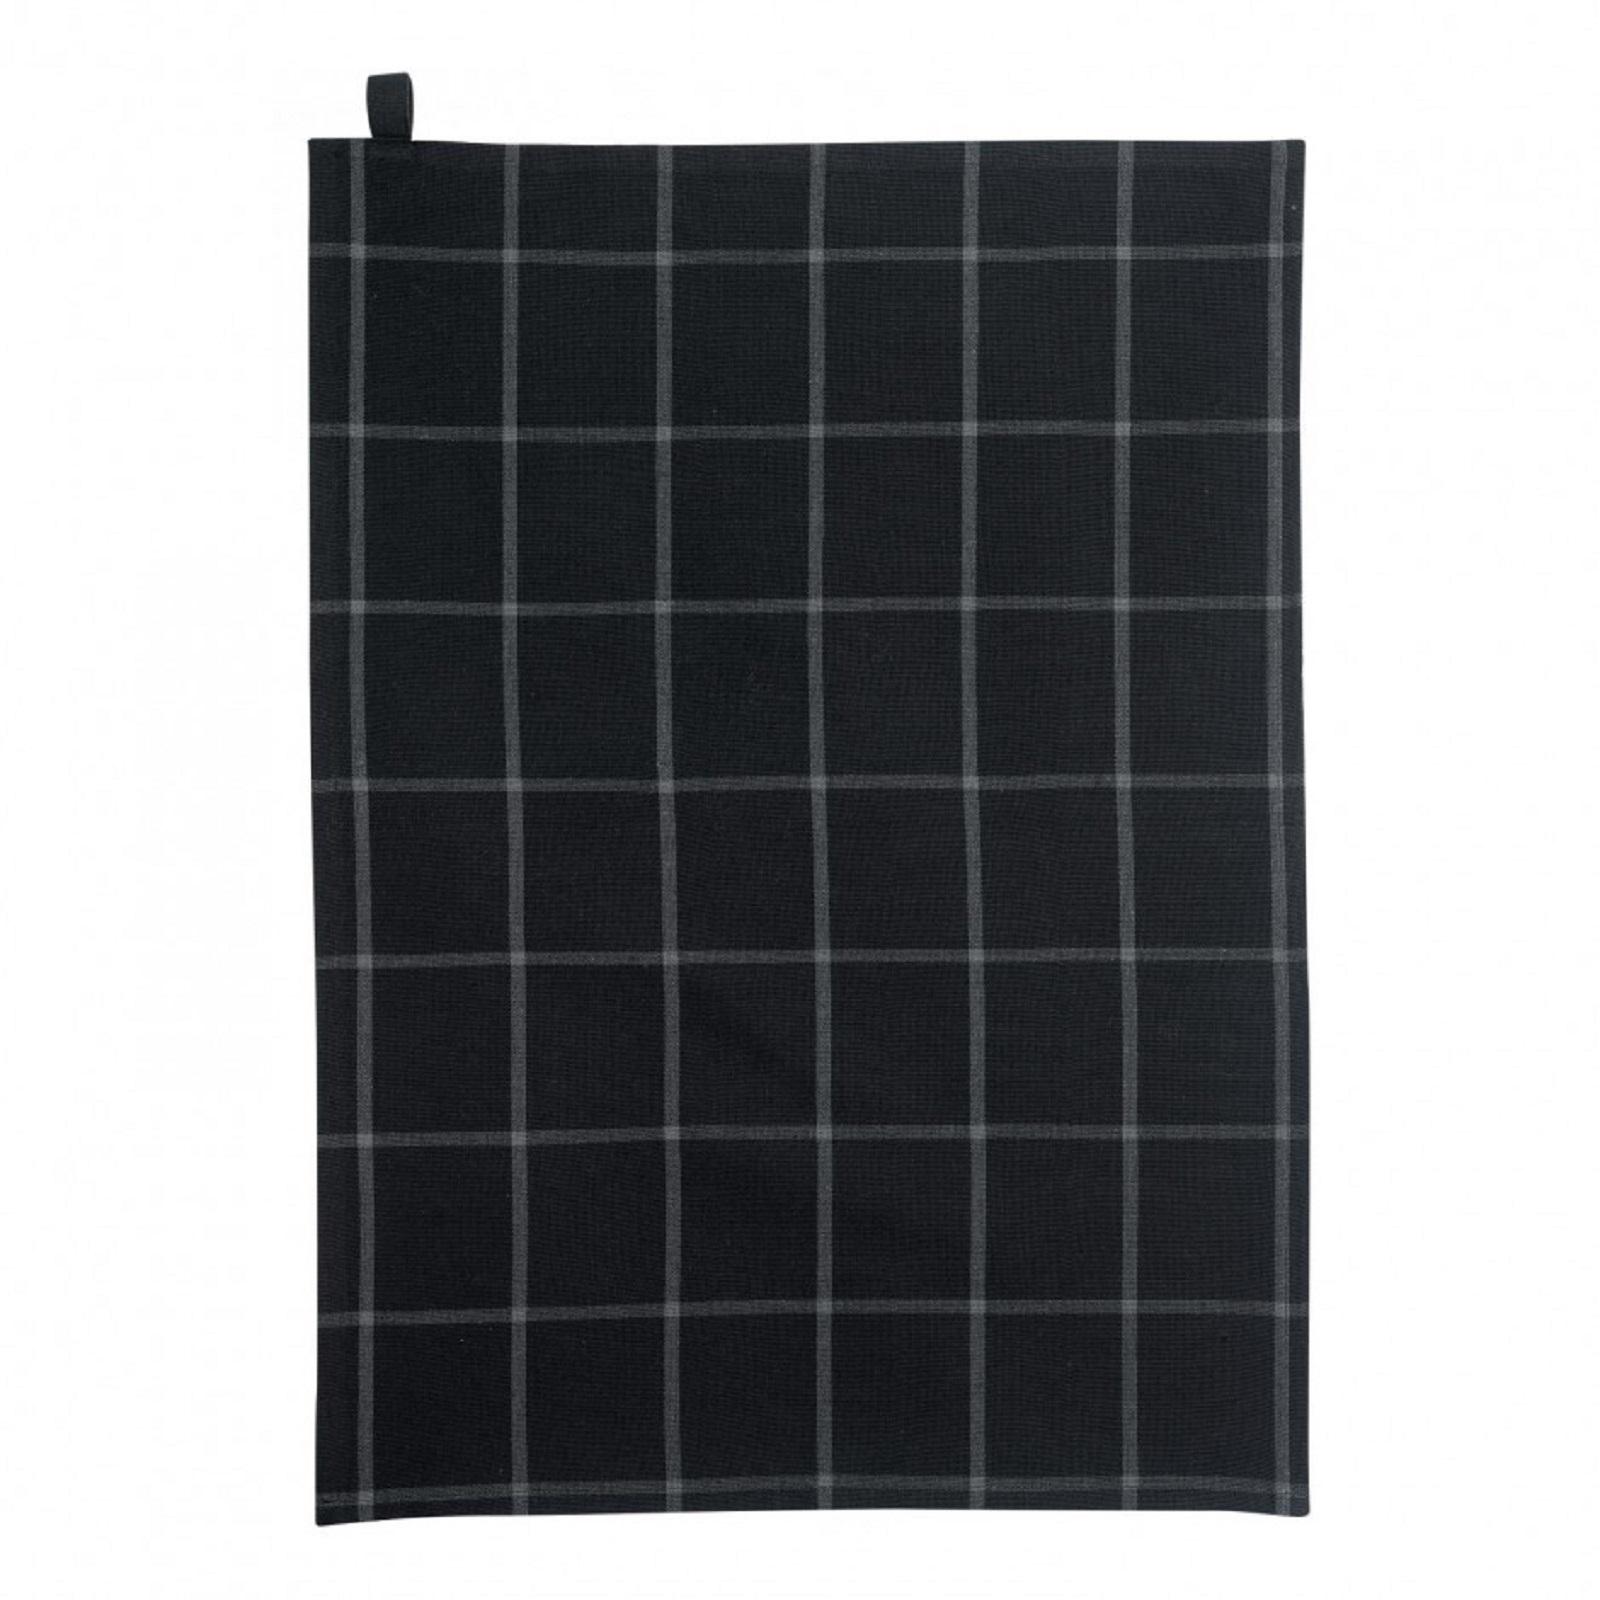 Онлайн каталог PROMENU: Полотенце кухонное Winkler DOHA, размеры  50х70 см, черный  3737079000